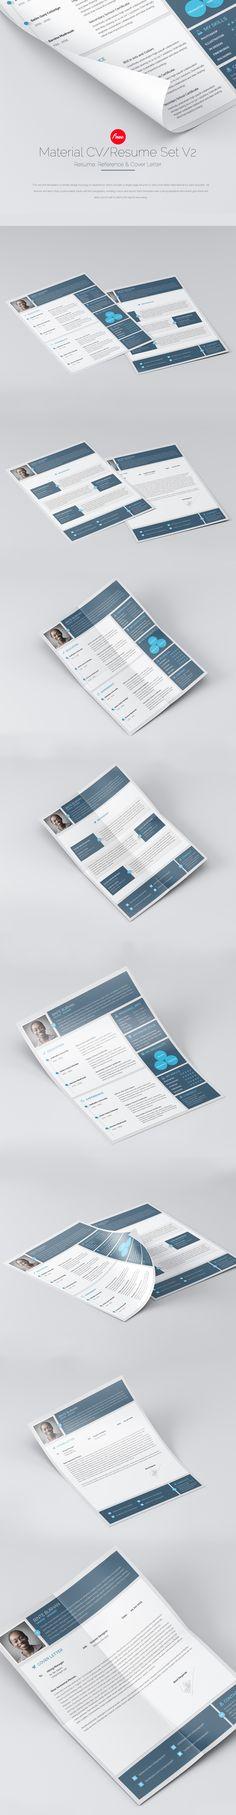 Minimal Elegant CV Resume And Cover Letter Mockup PSD Resume - ups resume